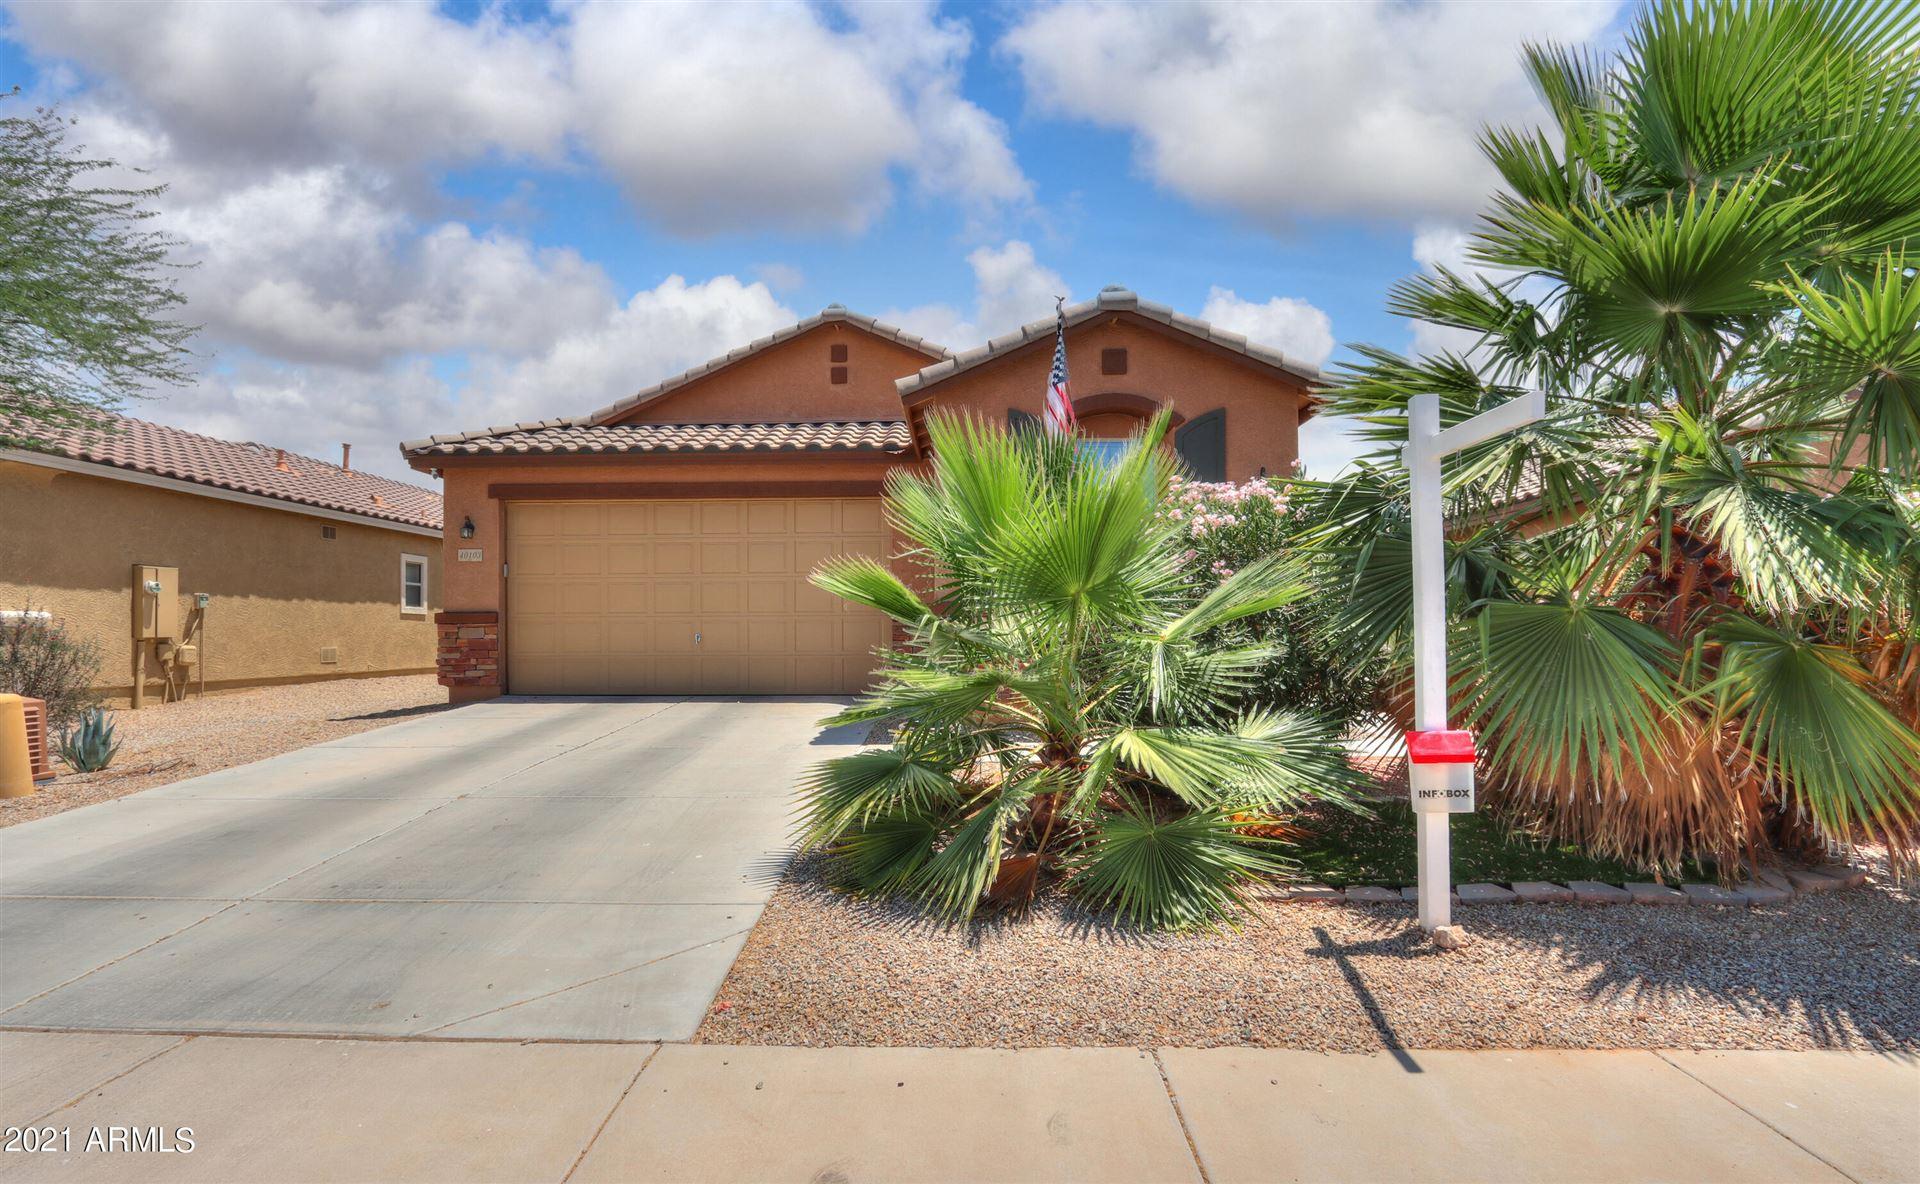 Photo for 40103 W BONNEAU Street, Maricopa, AZ 85138 (MLS # 6248344)